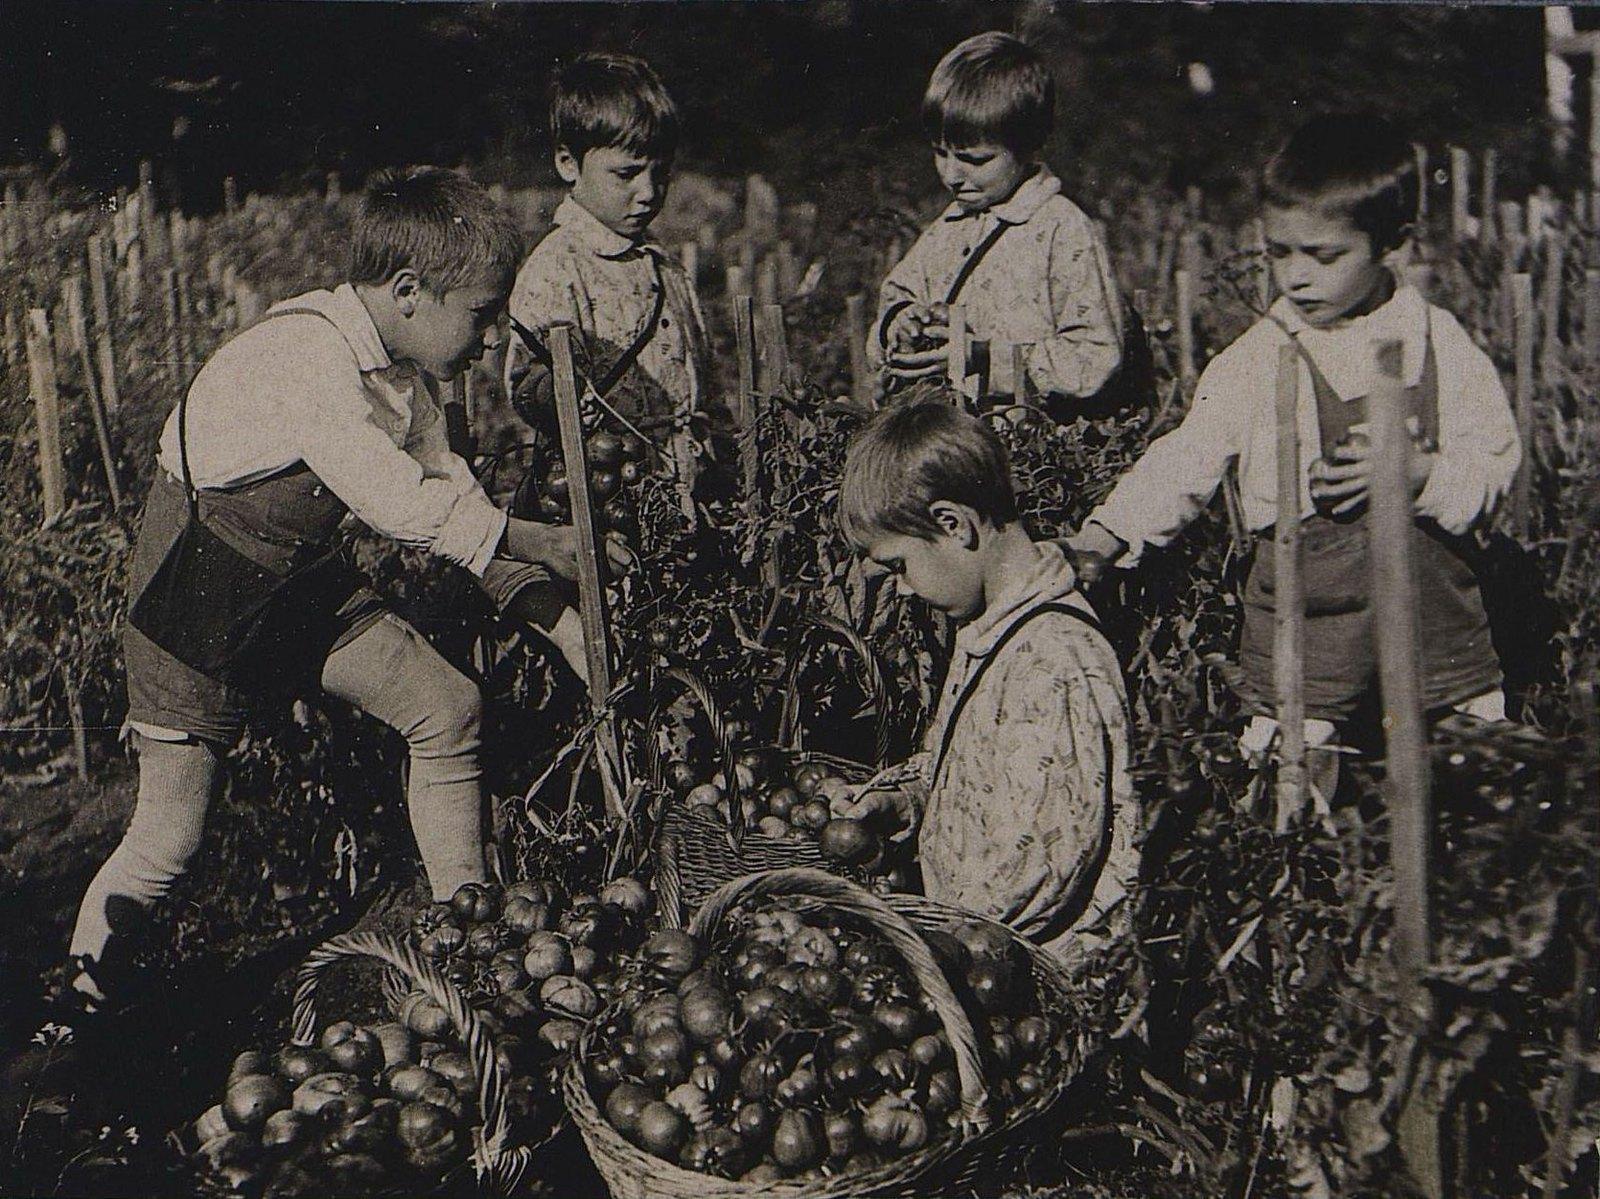 35. Воспитанники Детского дома на огороде собирают помидоры